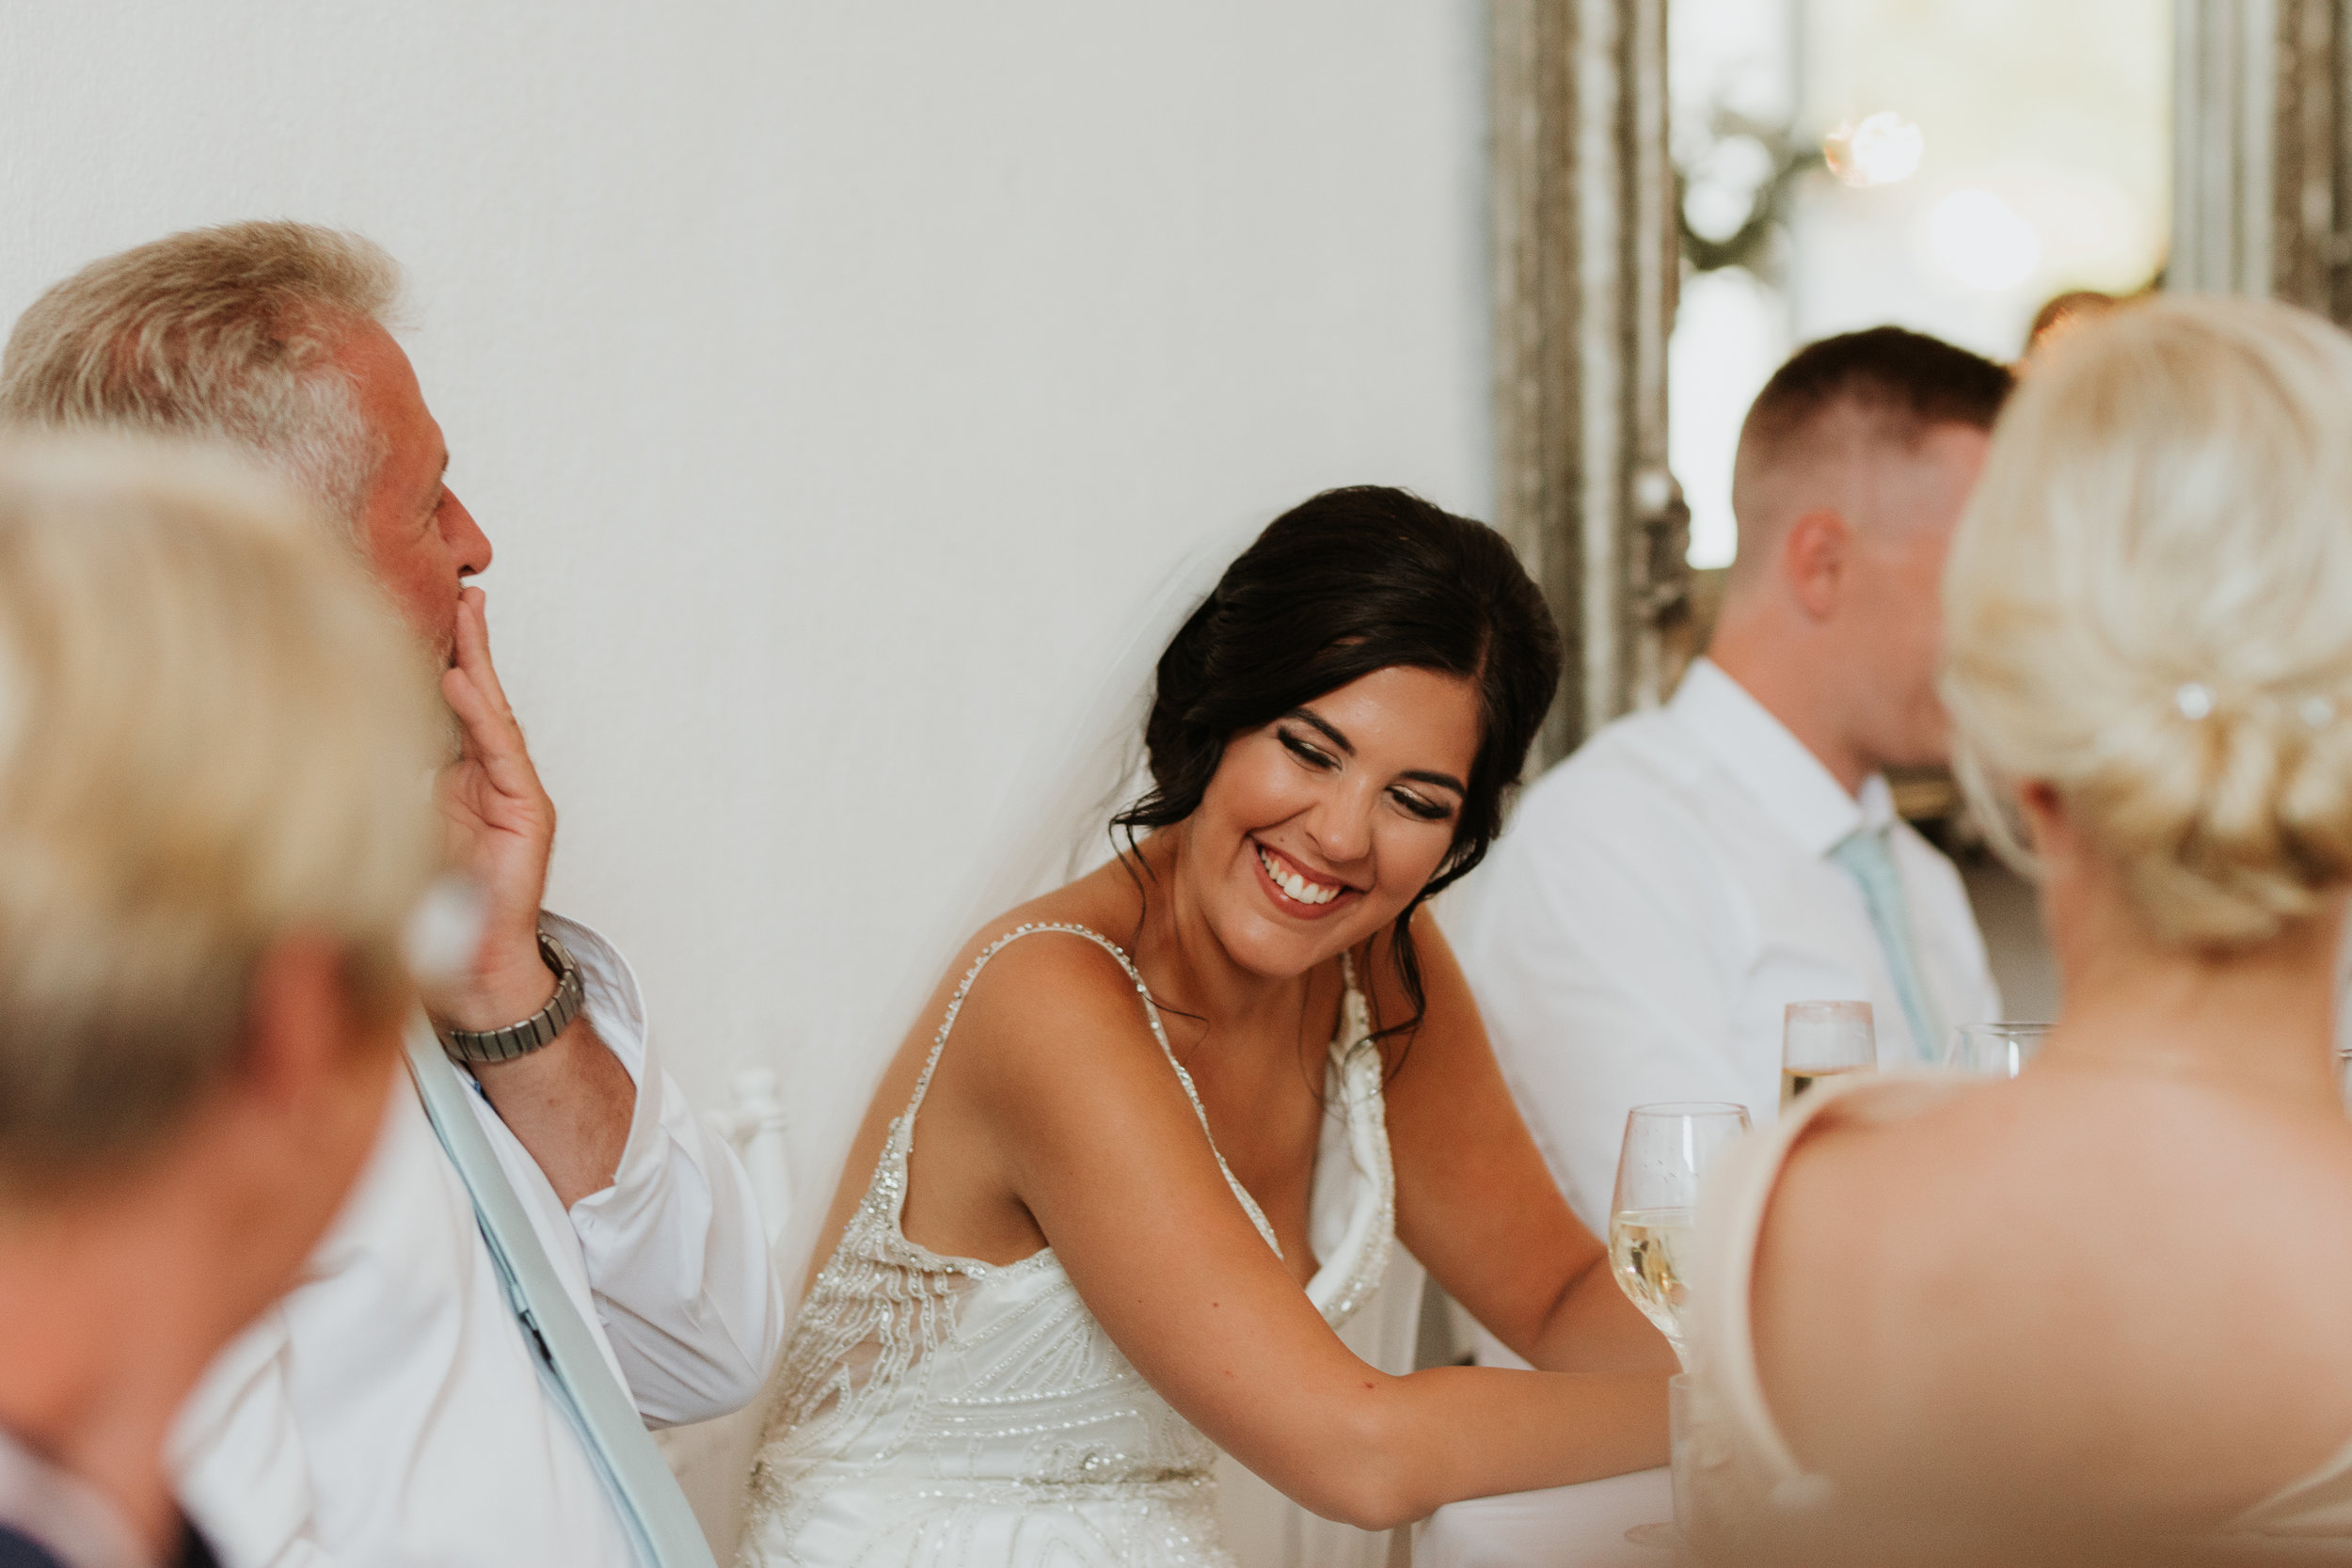 Oxfordshire-wedding-photographer-74.jpg